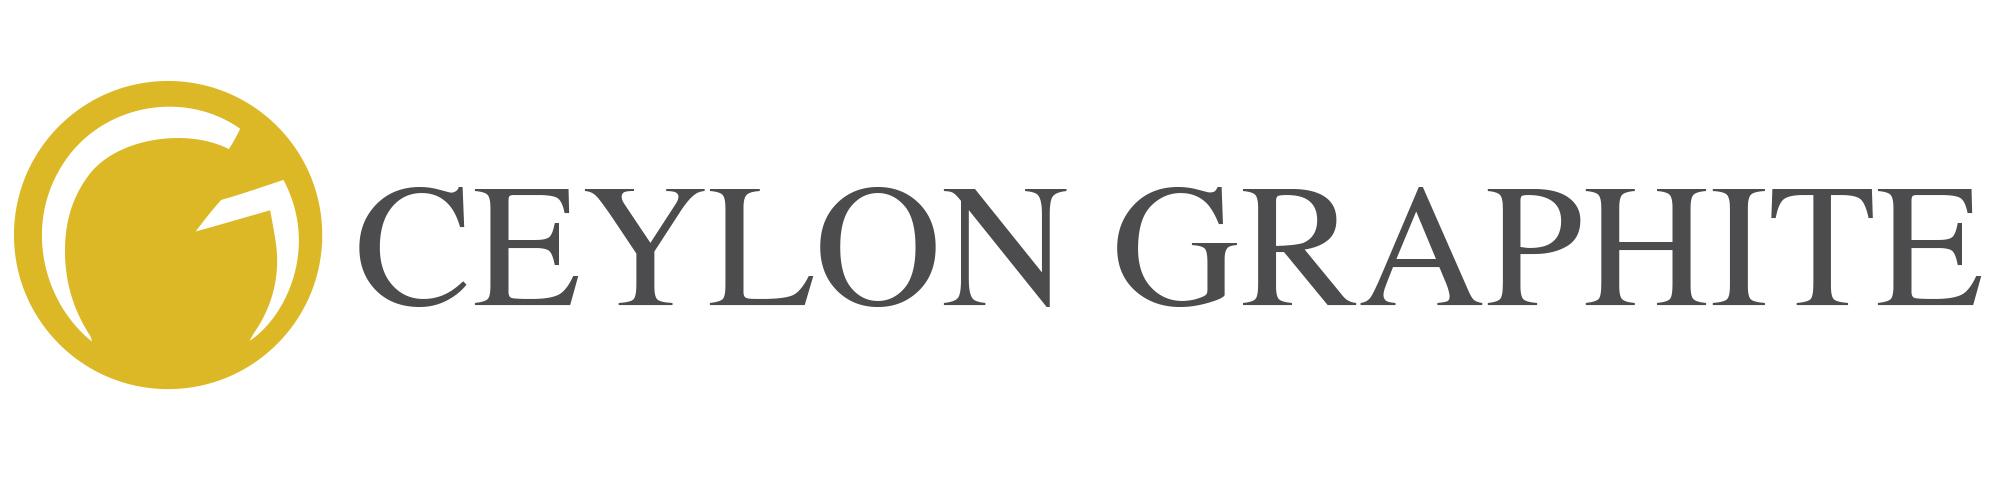 Ceylon Graphite – Veteran Graphite Mining and Upgrading Executive Don Baxter Joins the Board of Ceylon Graphite